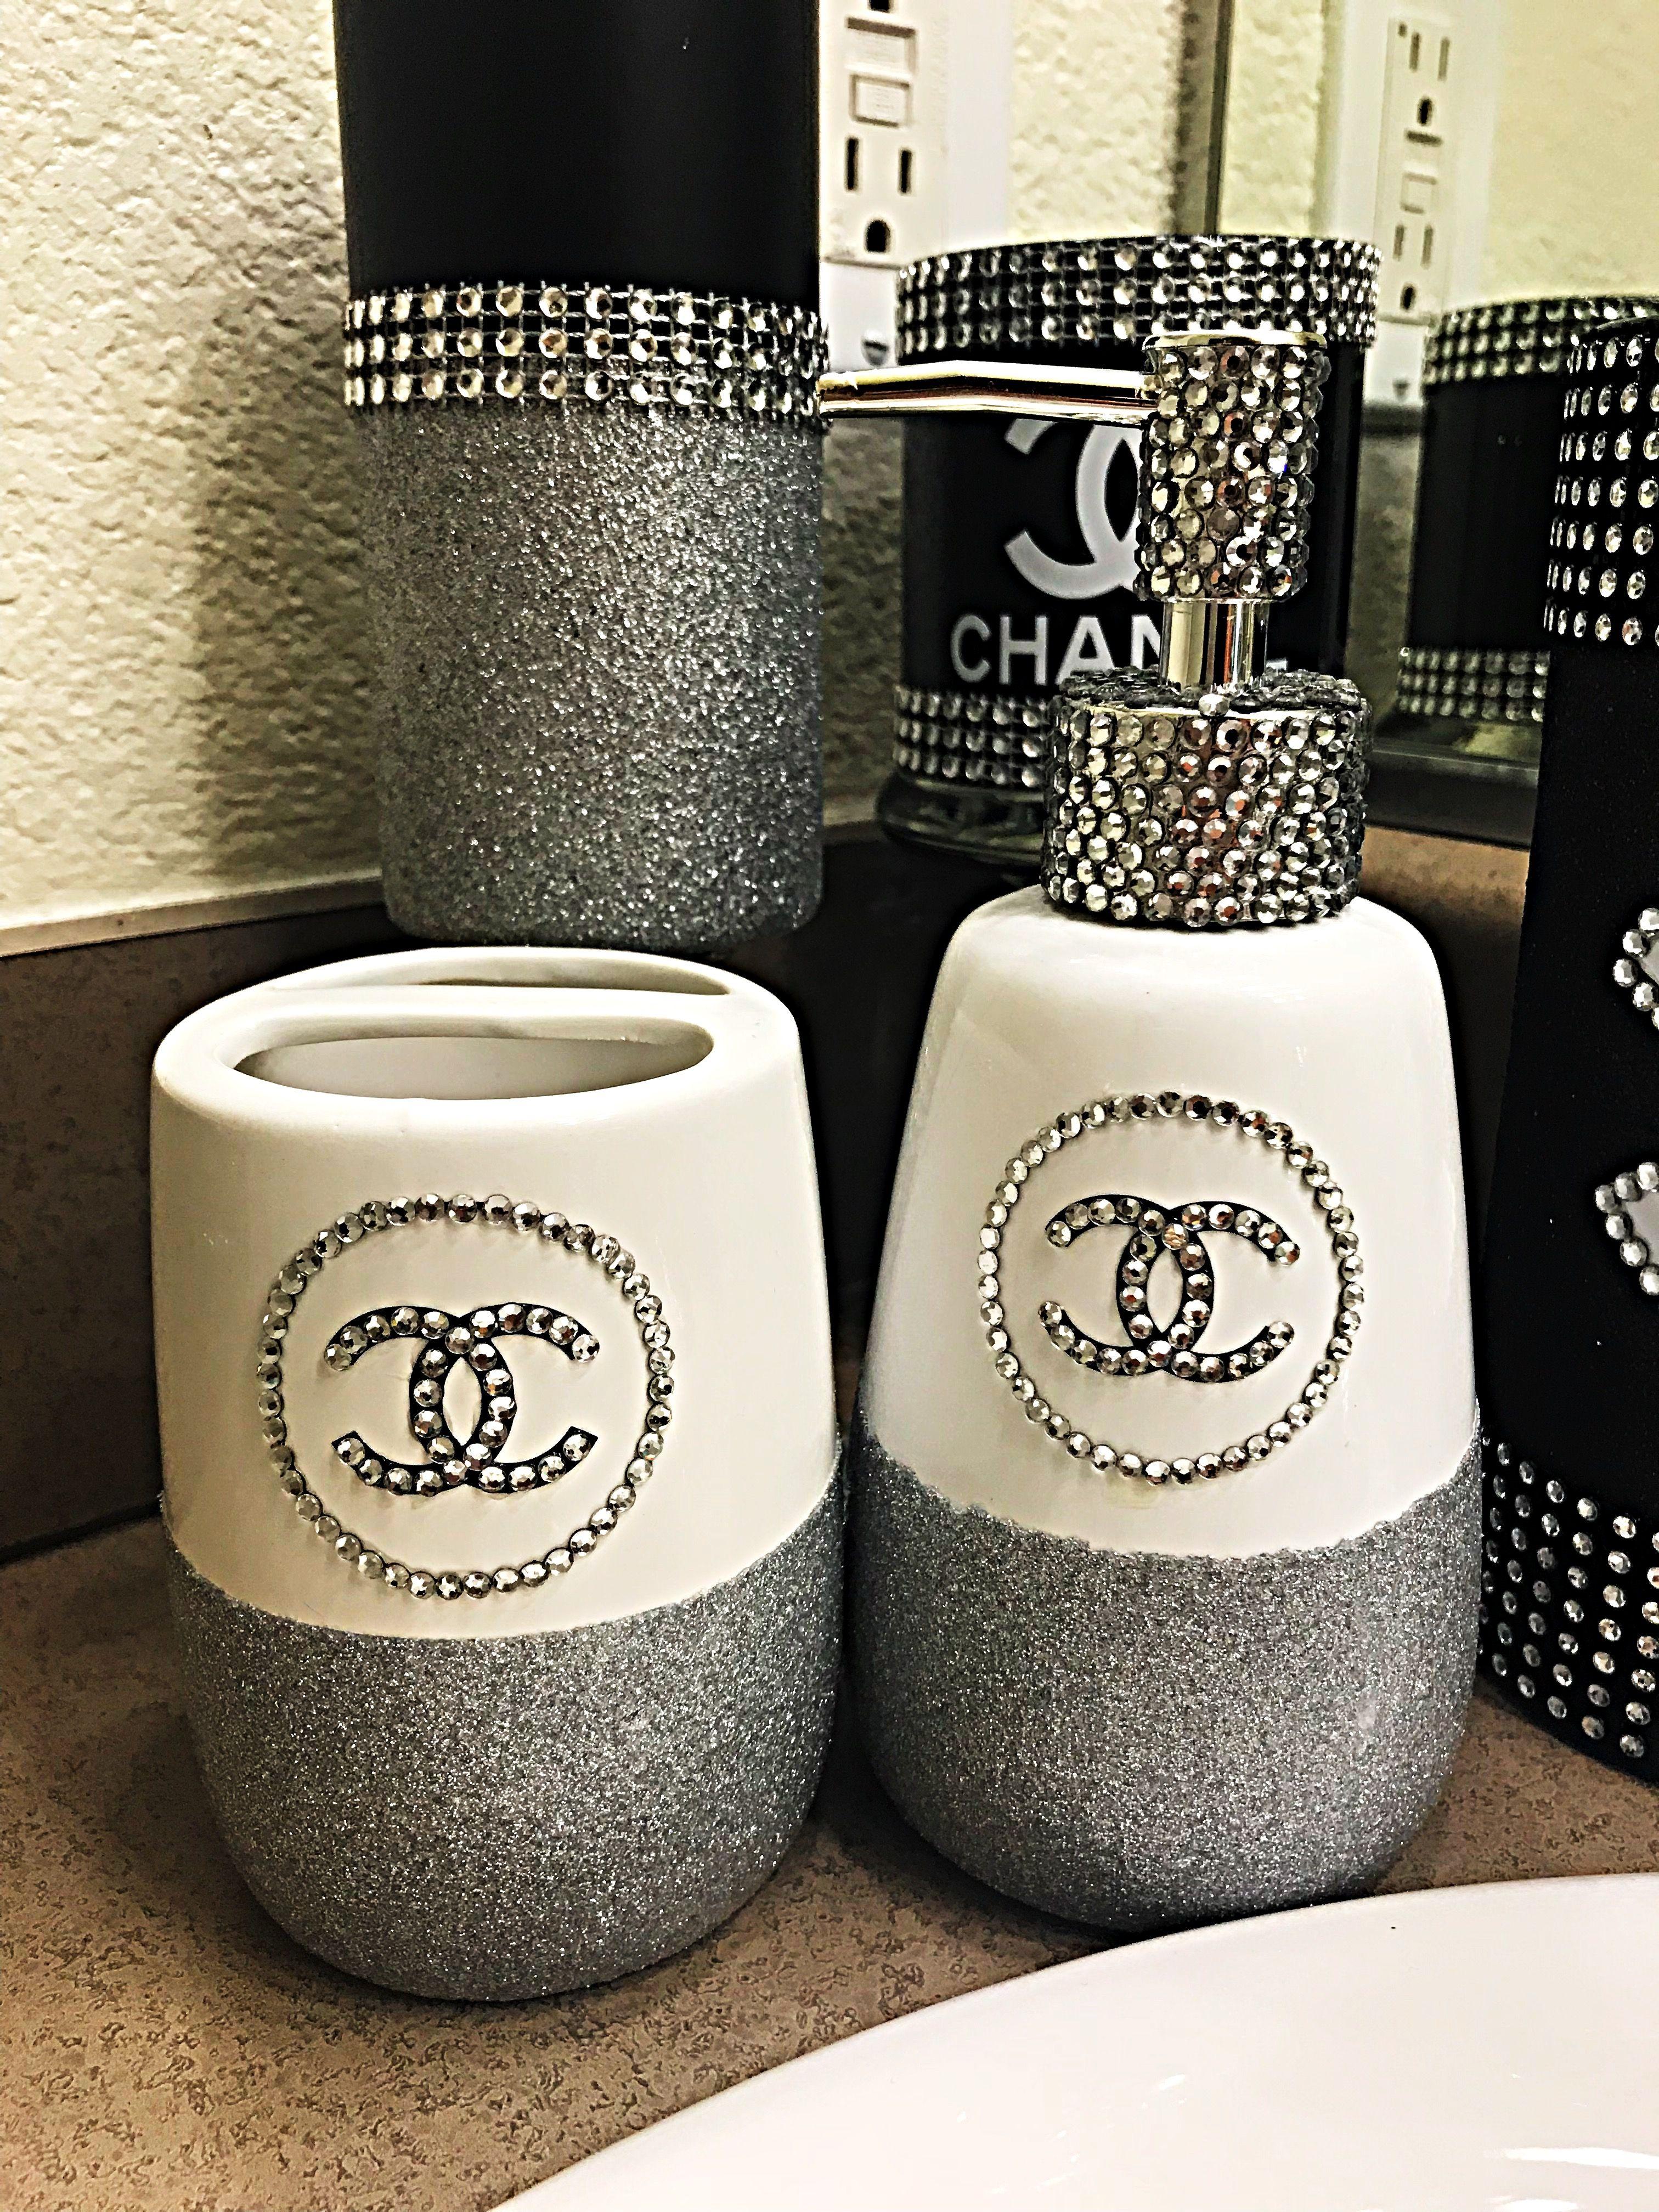 Chanel Bathroom Home Decor Cute And Stylish Chanel Decor